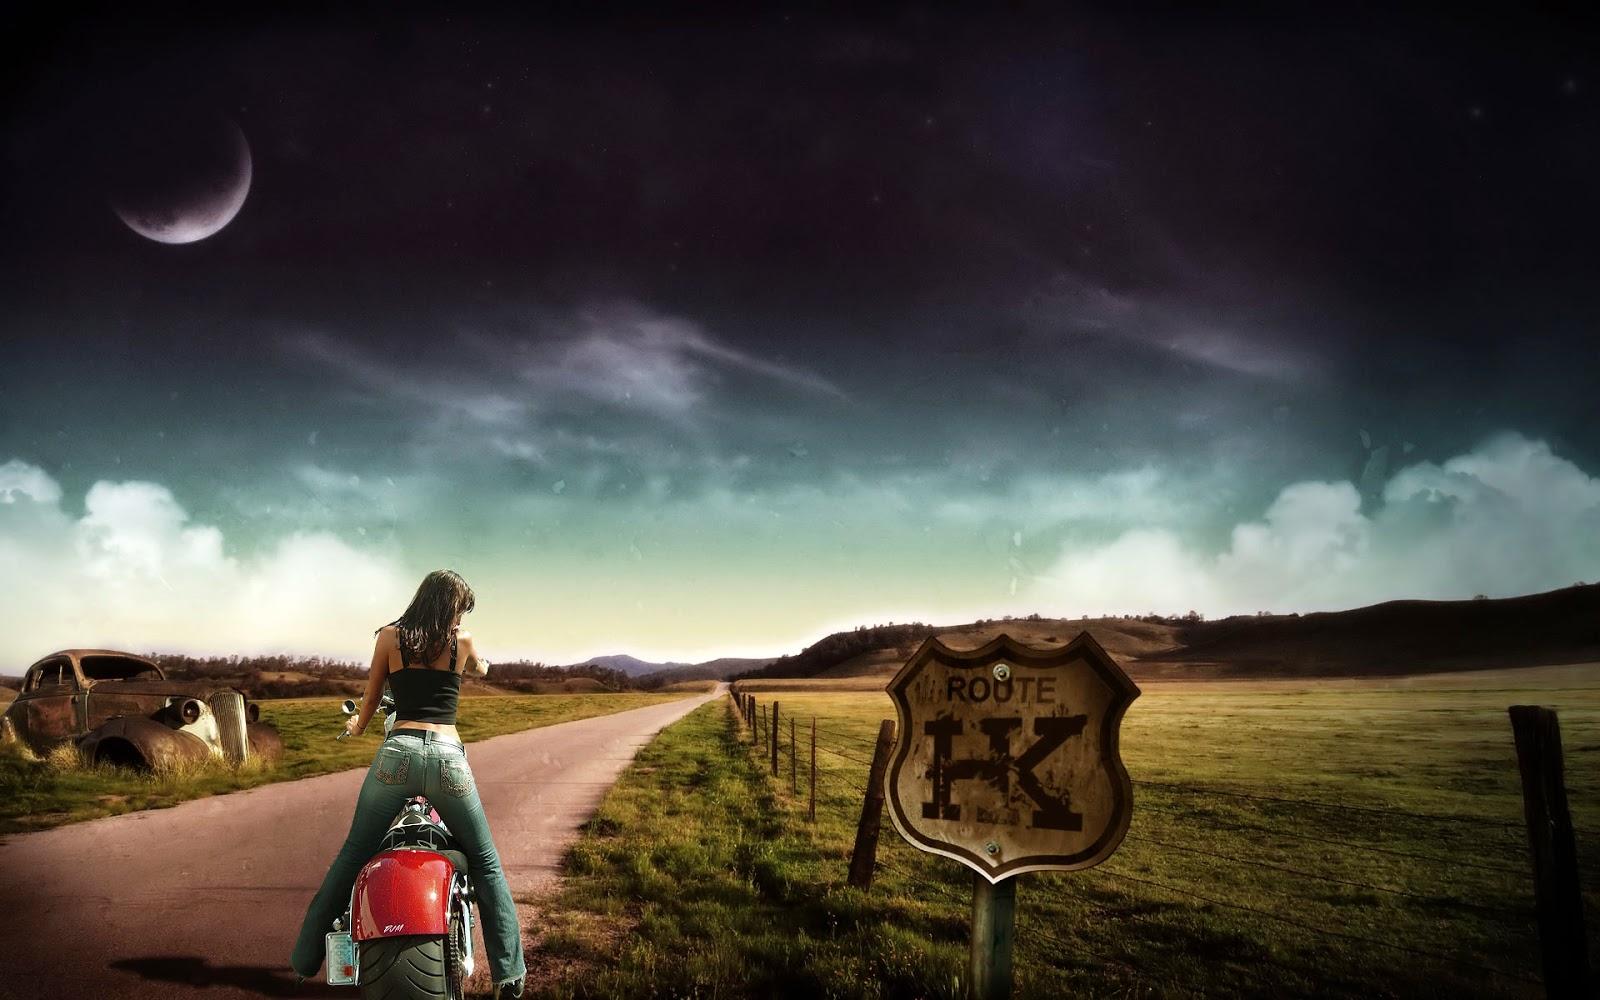 Wallpaper Download Hd Love Biker